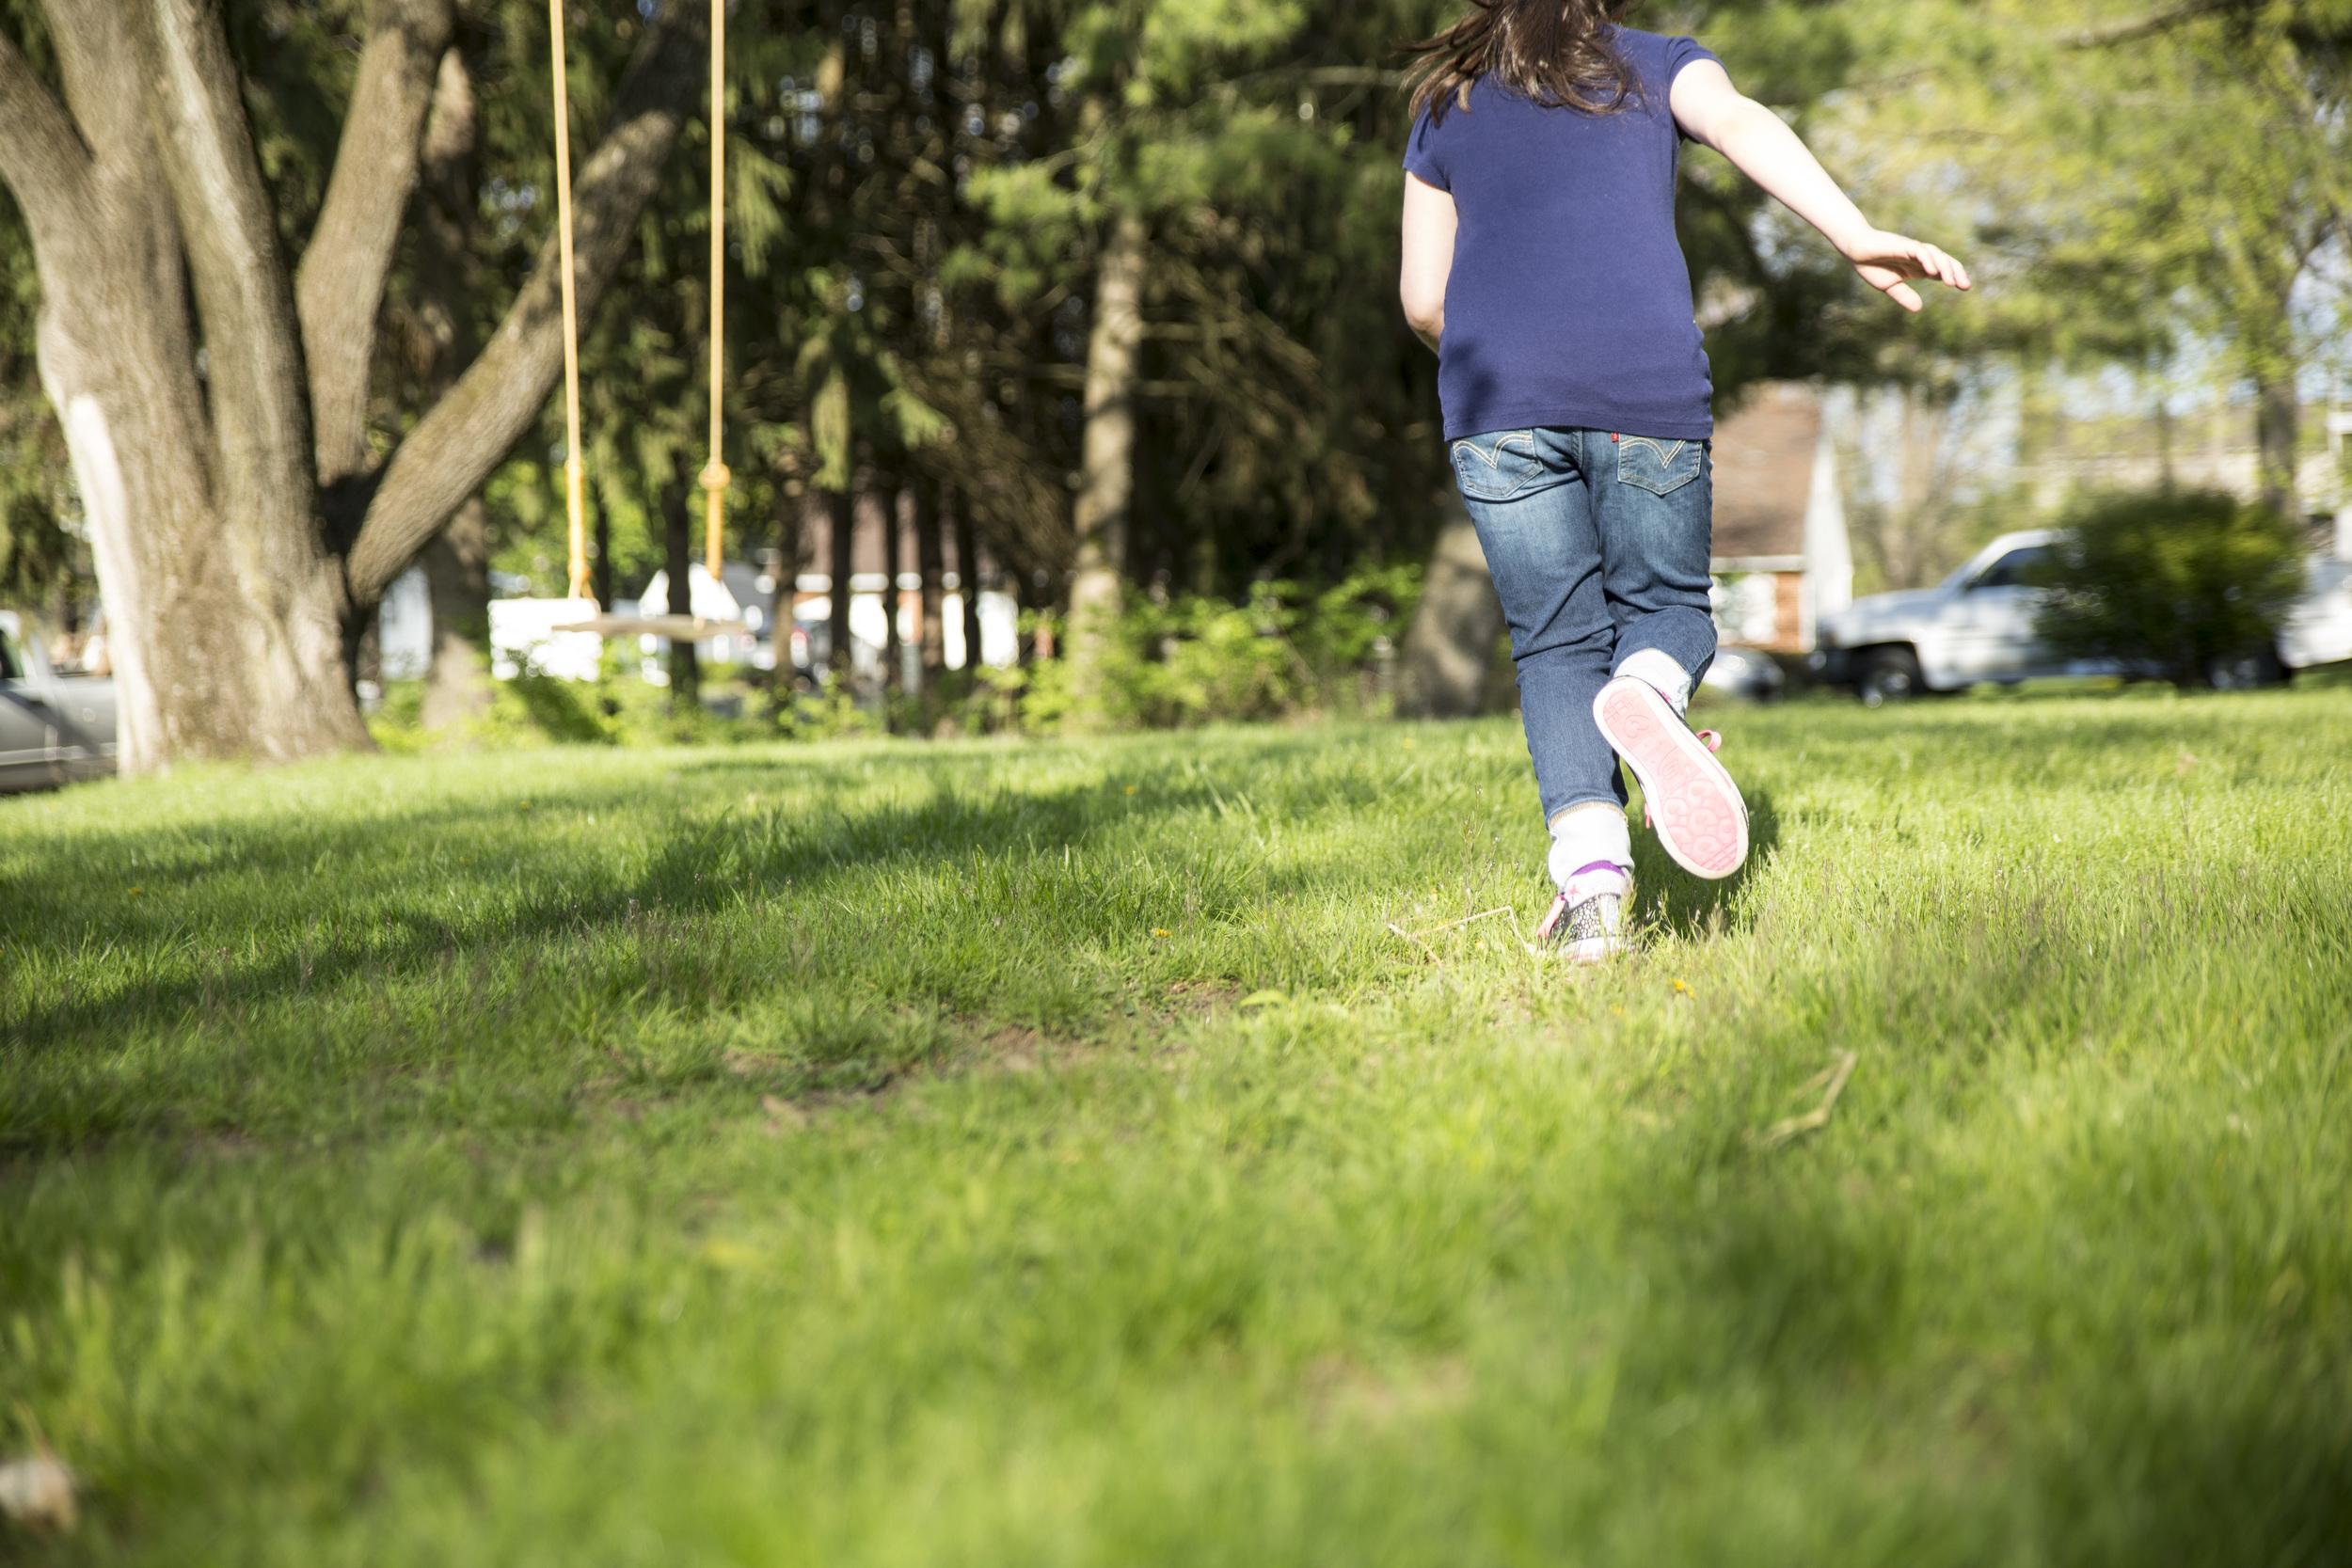 backyard-girl-grass-photo.jpg